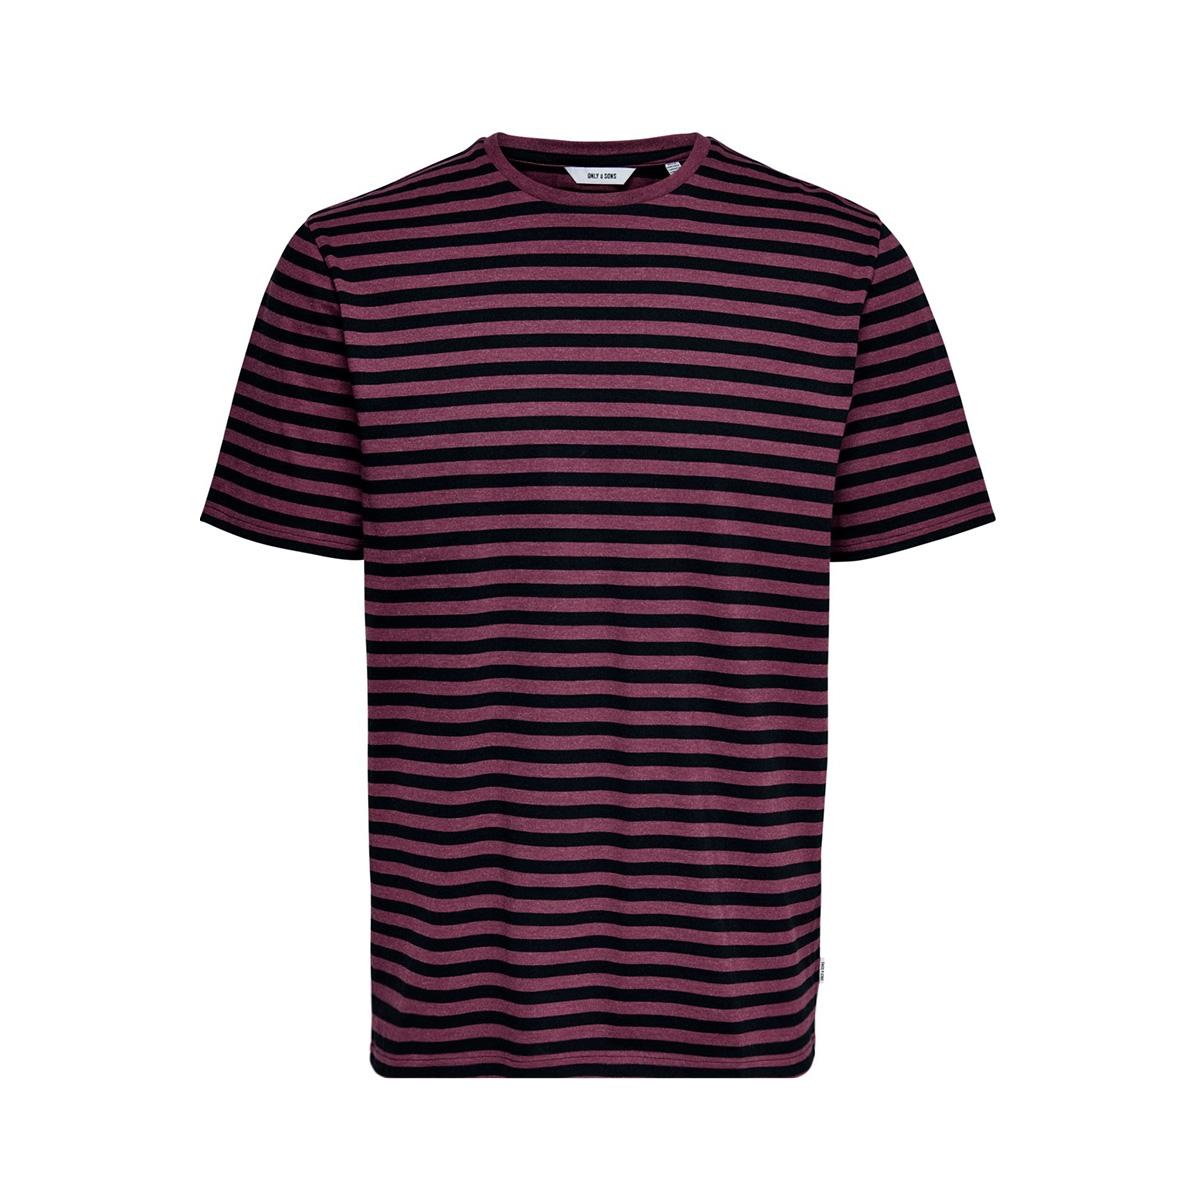 onsjamie ss stripe reg tee noos 22013203 only & sons t-shirt zinfandel/black